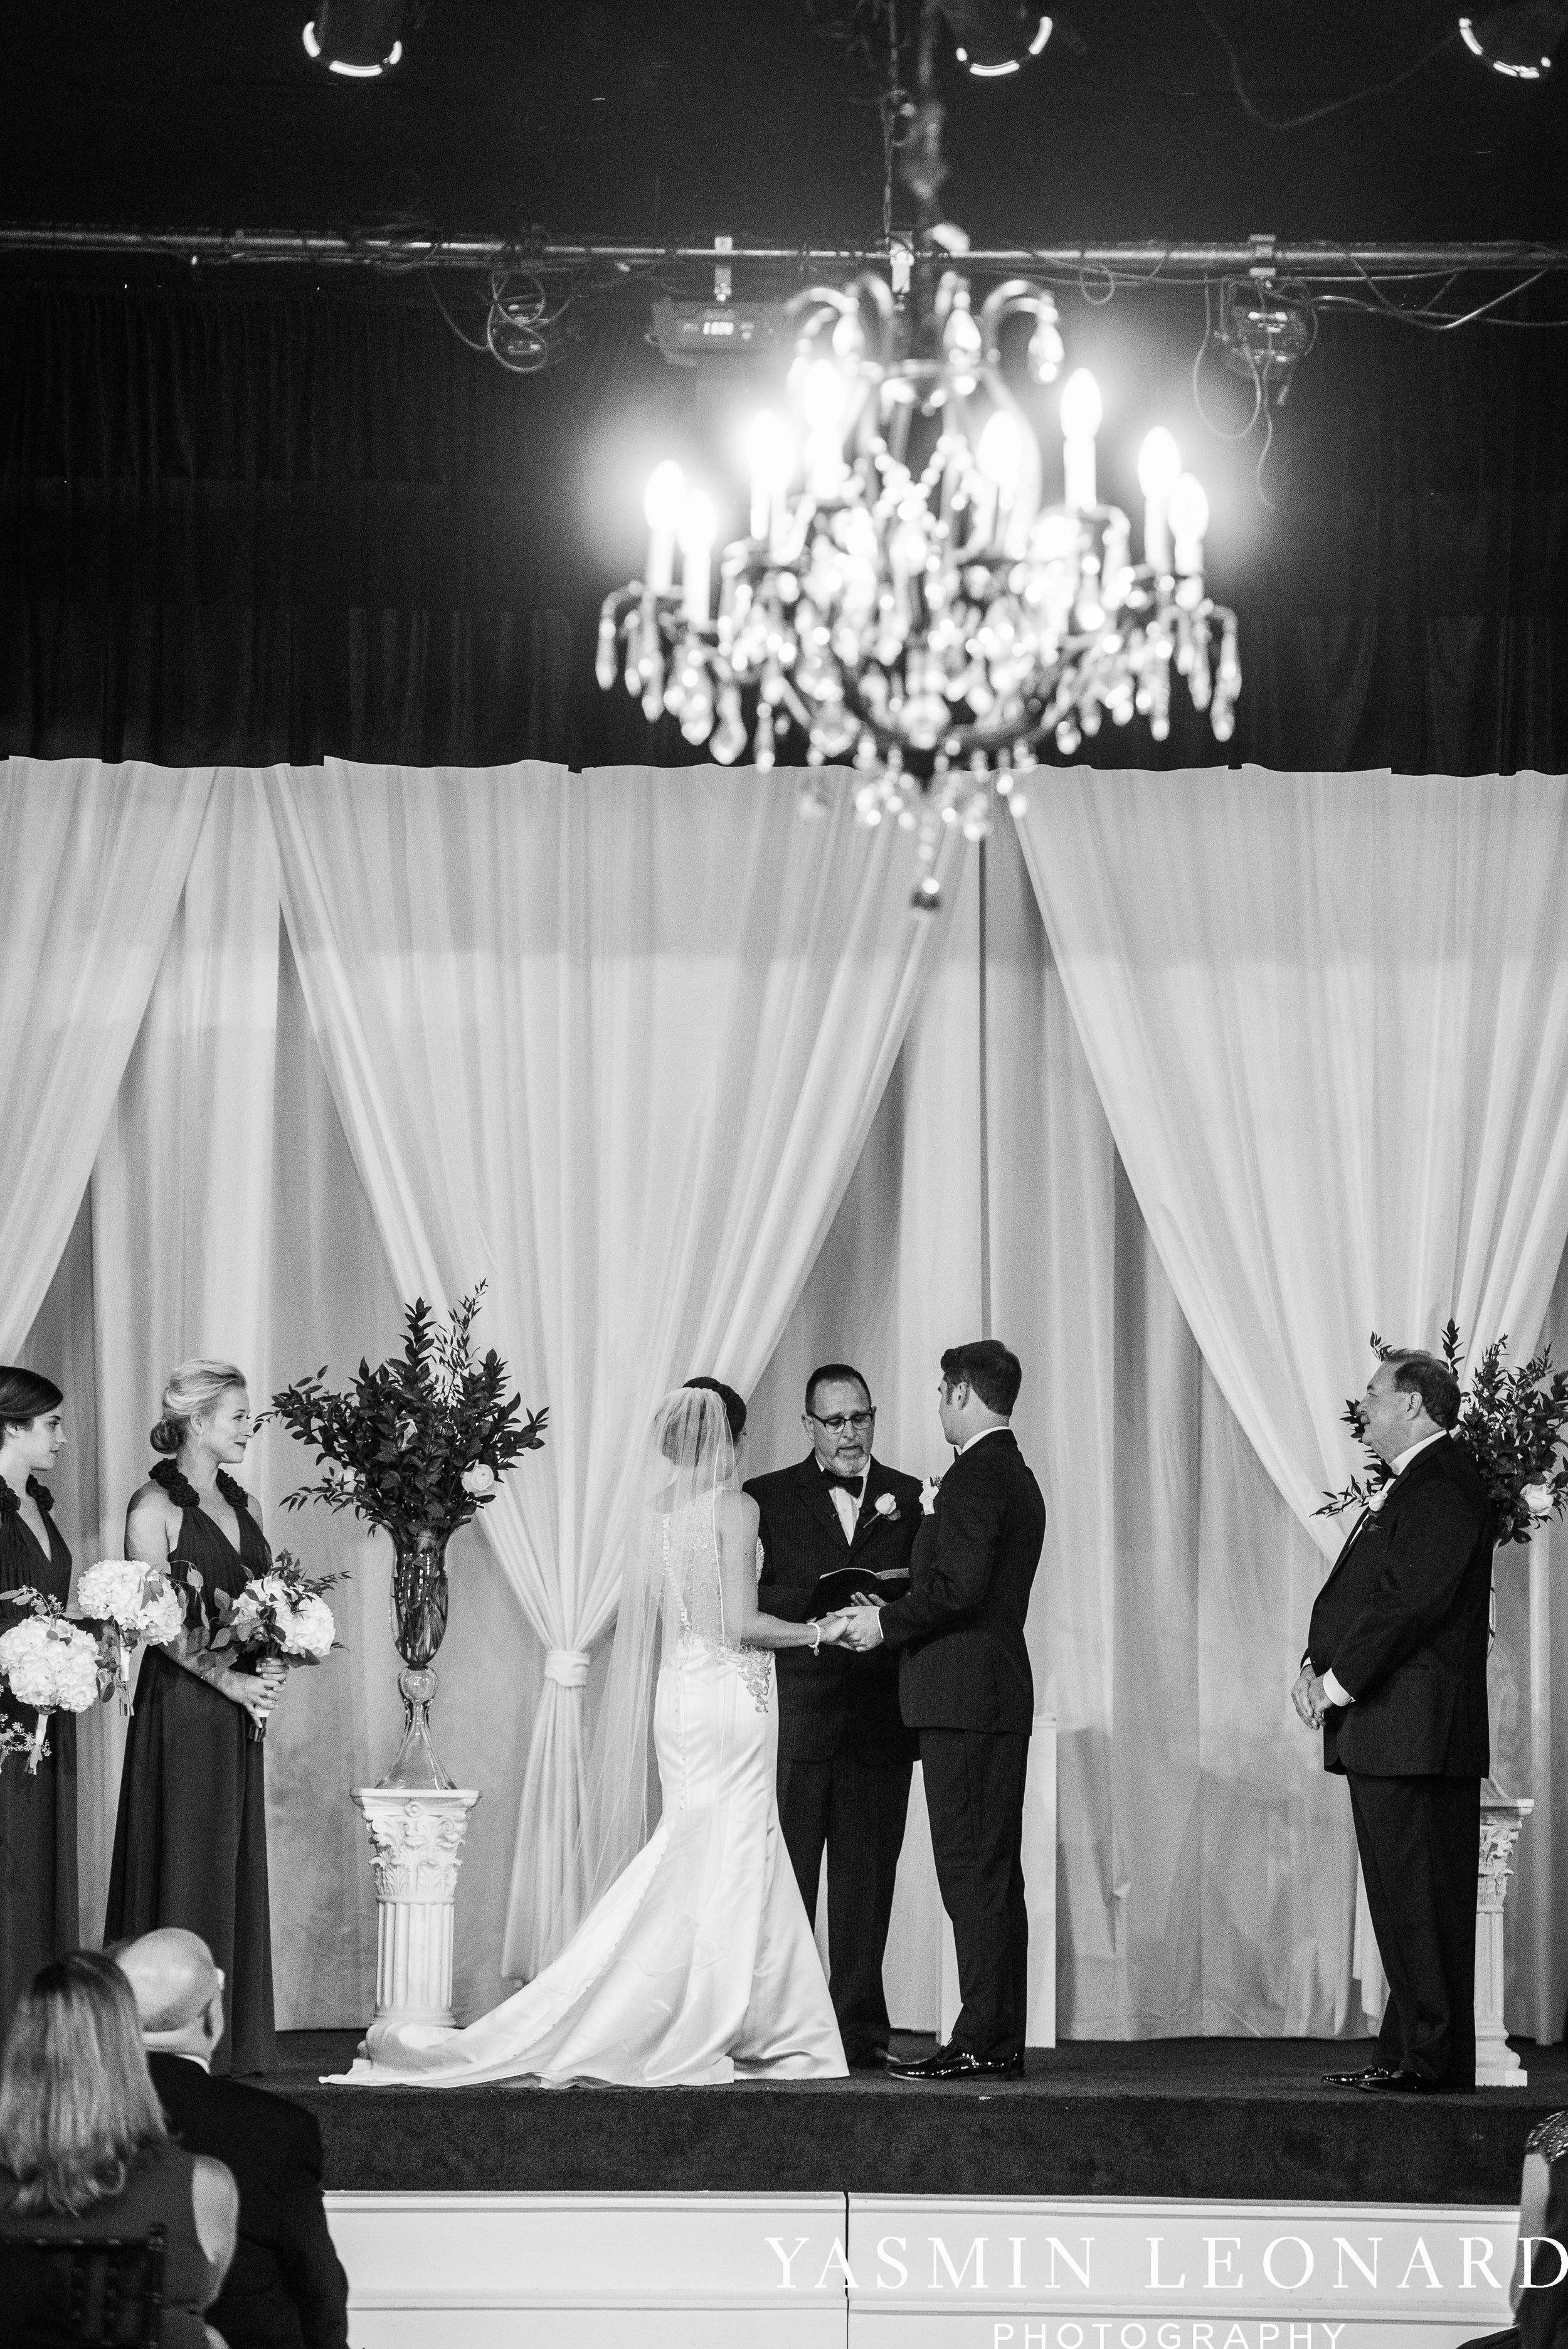 Millennium Center Wedding - Downtown Winston Salem - Winston Salem Wedding Photographer - Winston Salem Venues - Indoor Wedding Venues - NC Wedding Photographer - Yasmin Leonard Photography-39.jpg